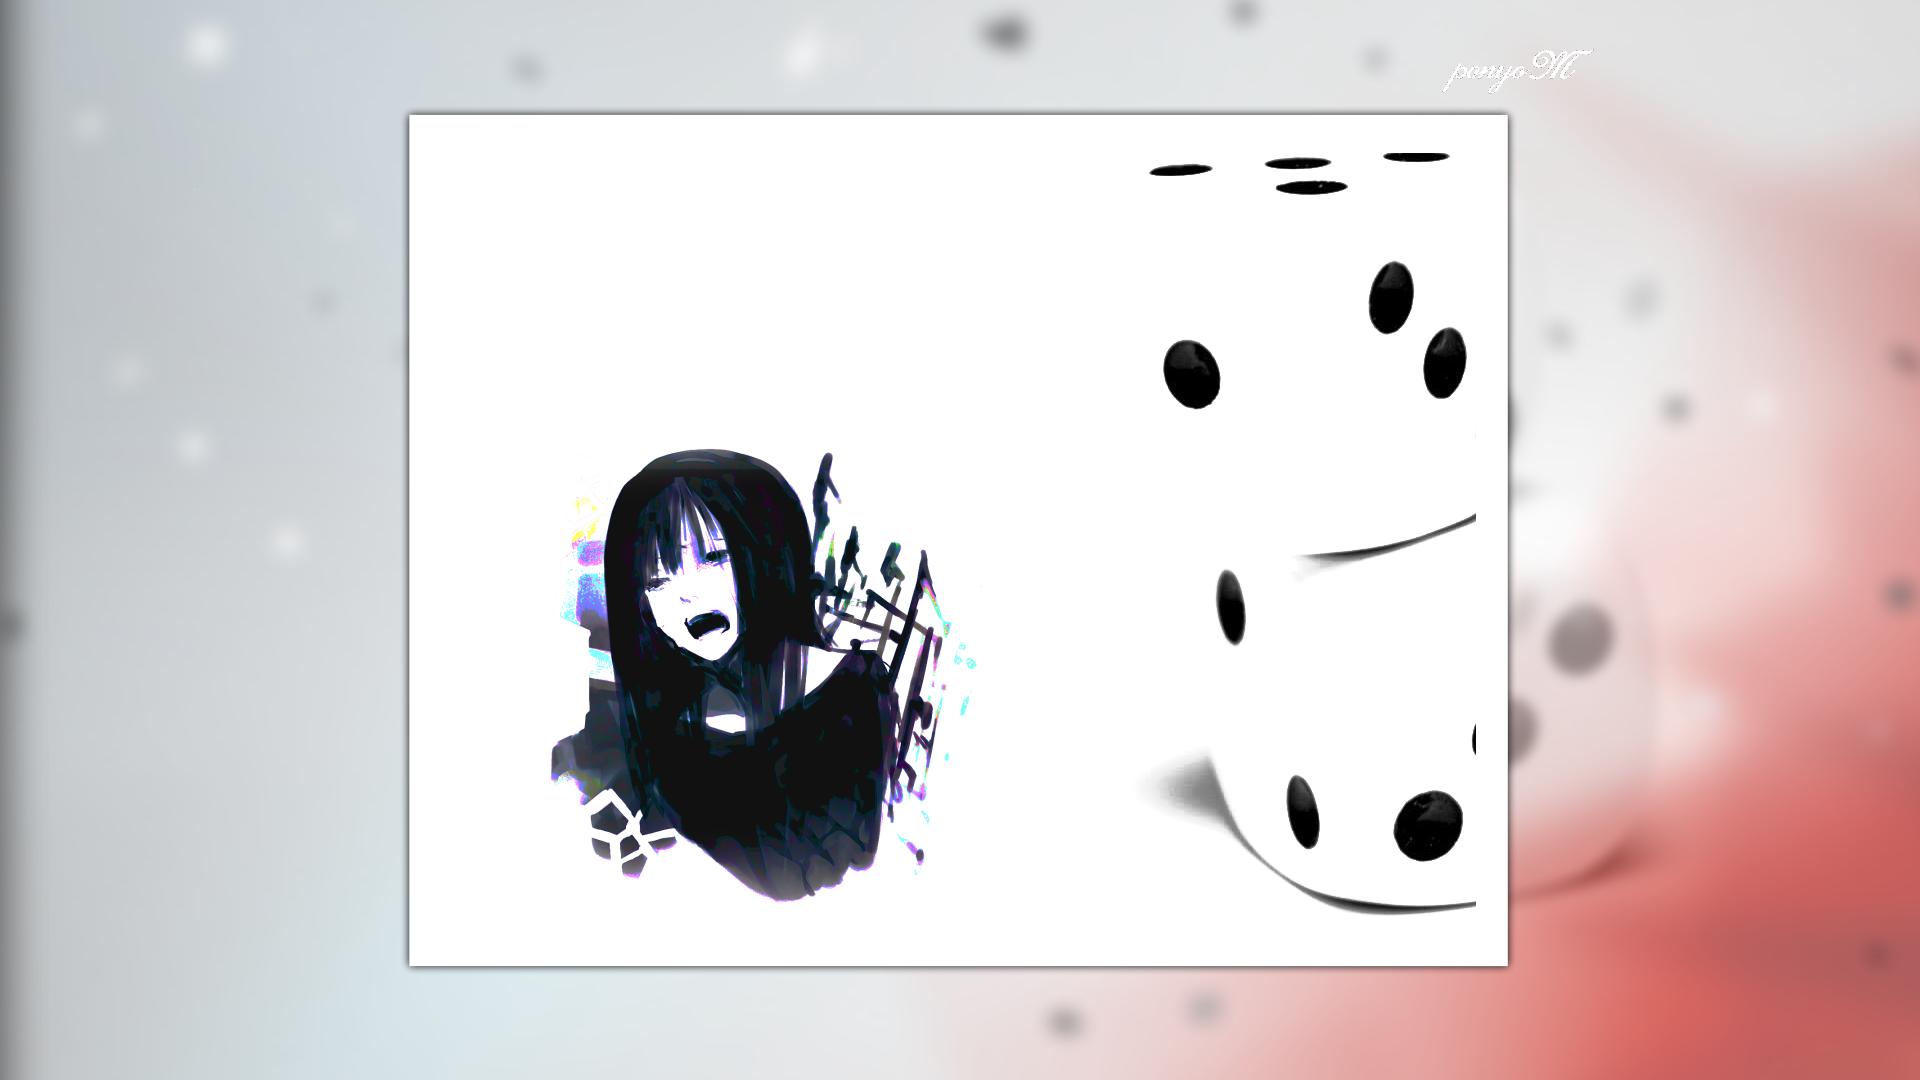 Anime 1920x1080 simple simple background dice anime girls anime